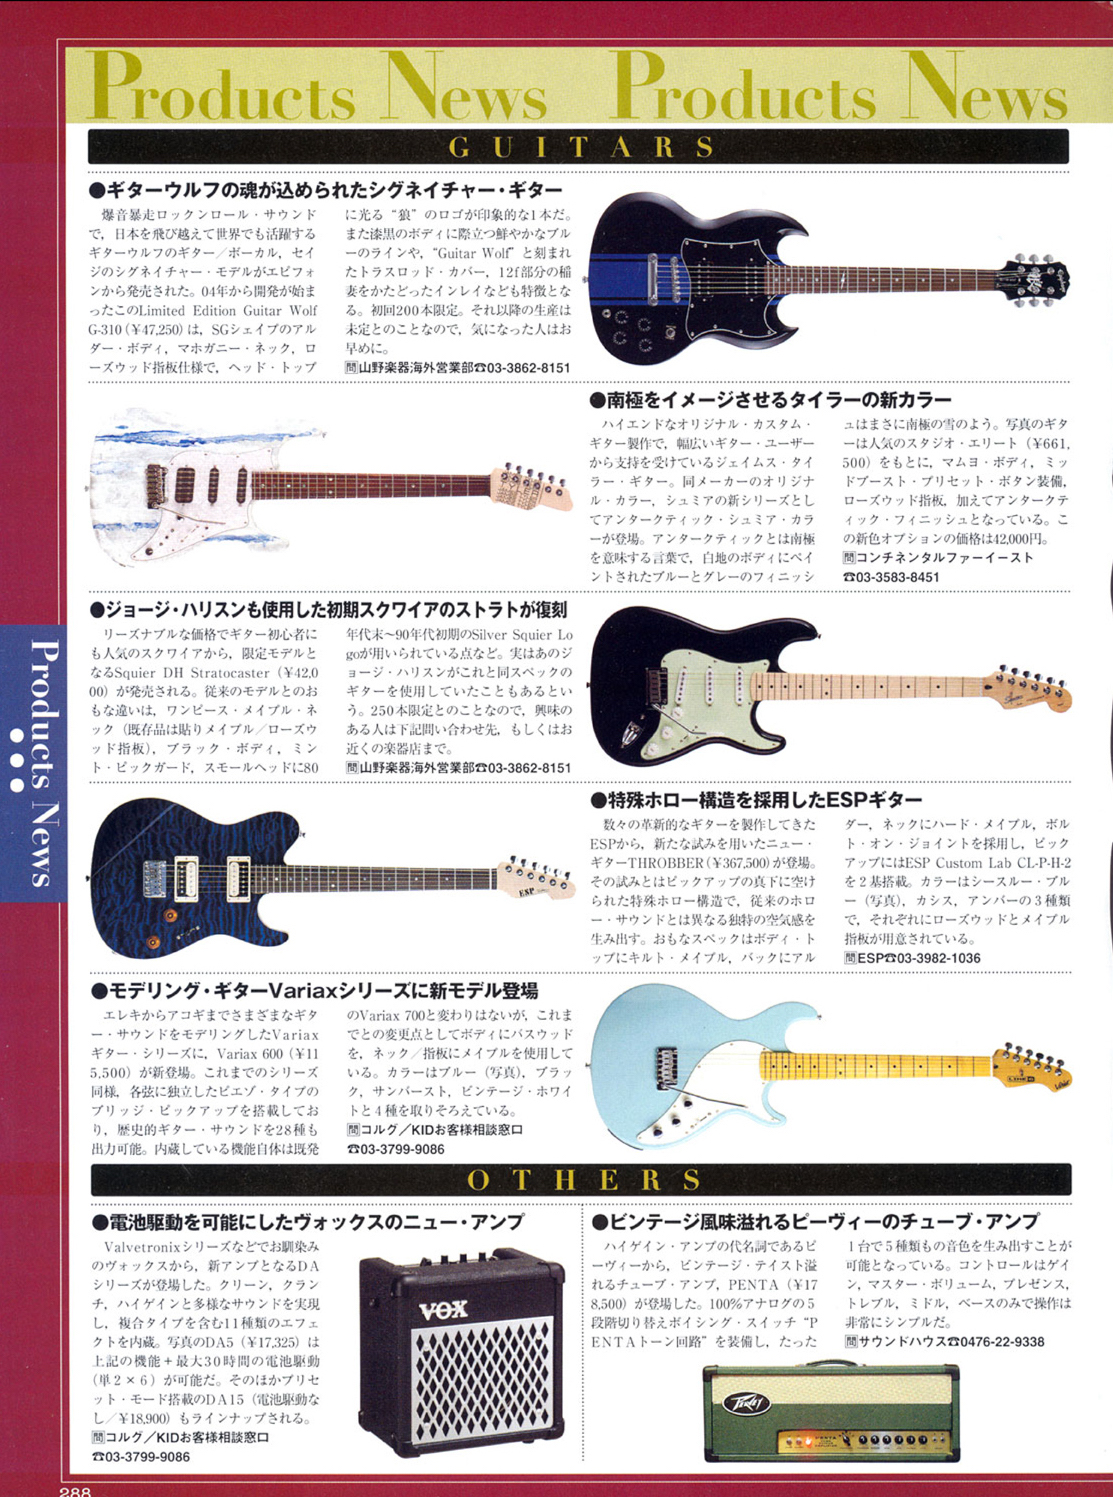 2006 Guitar Magazine - Jan.